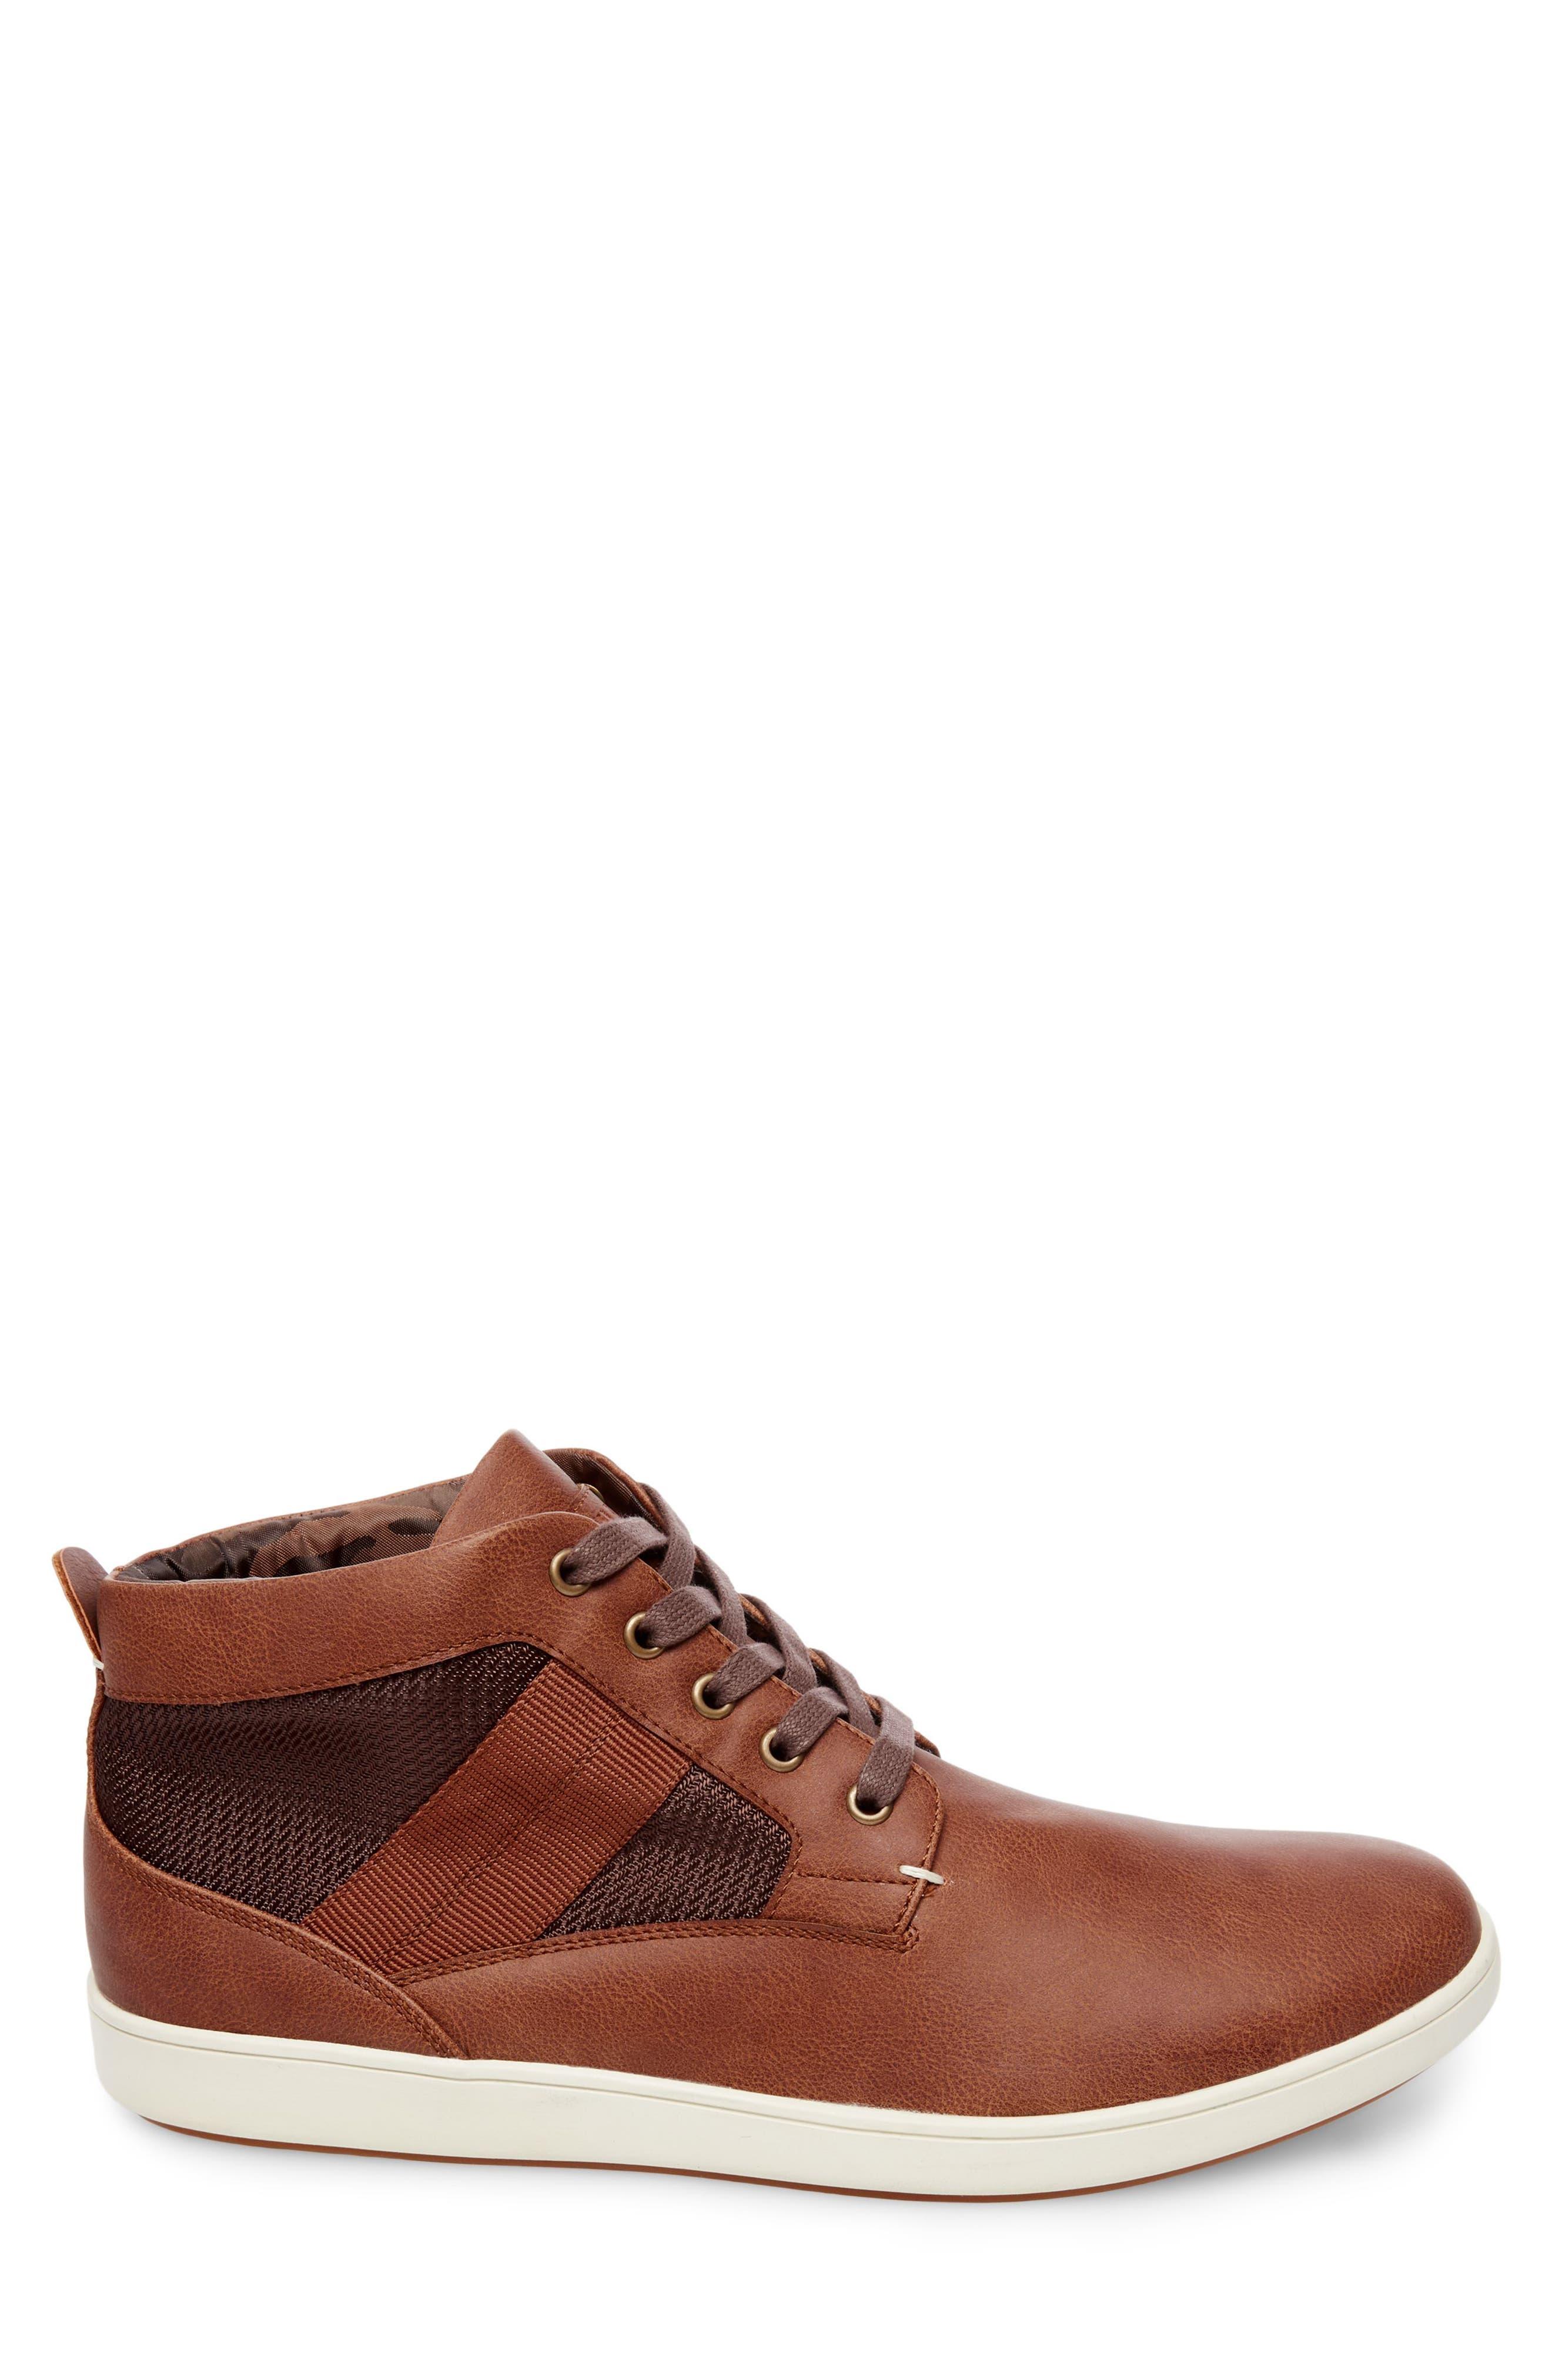 Frazier Sneaker Boot,                             Alternate thumbnail 3, color,                             Cognac